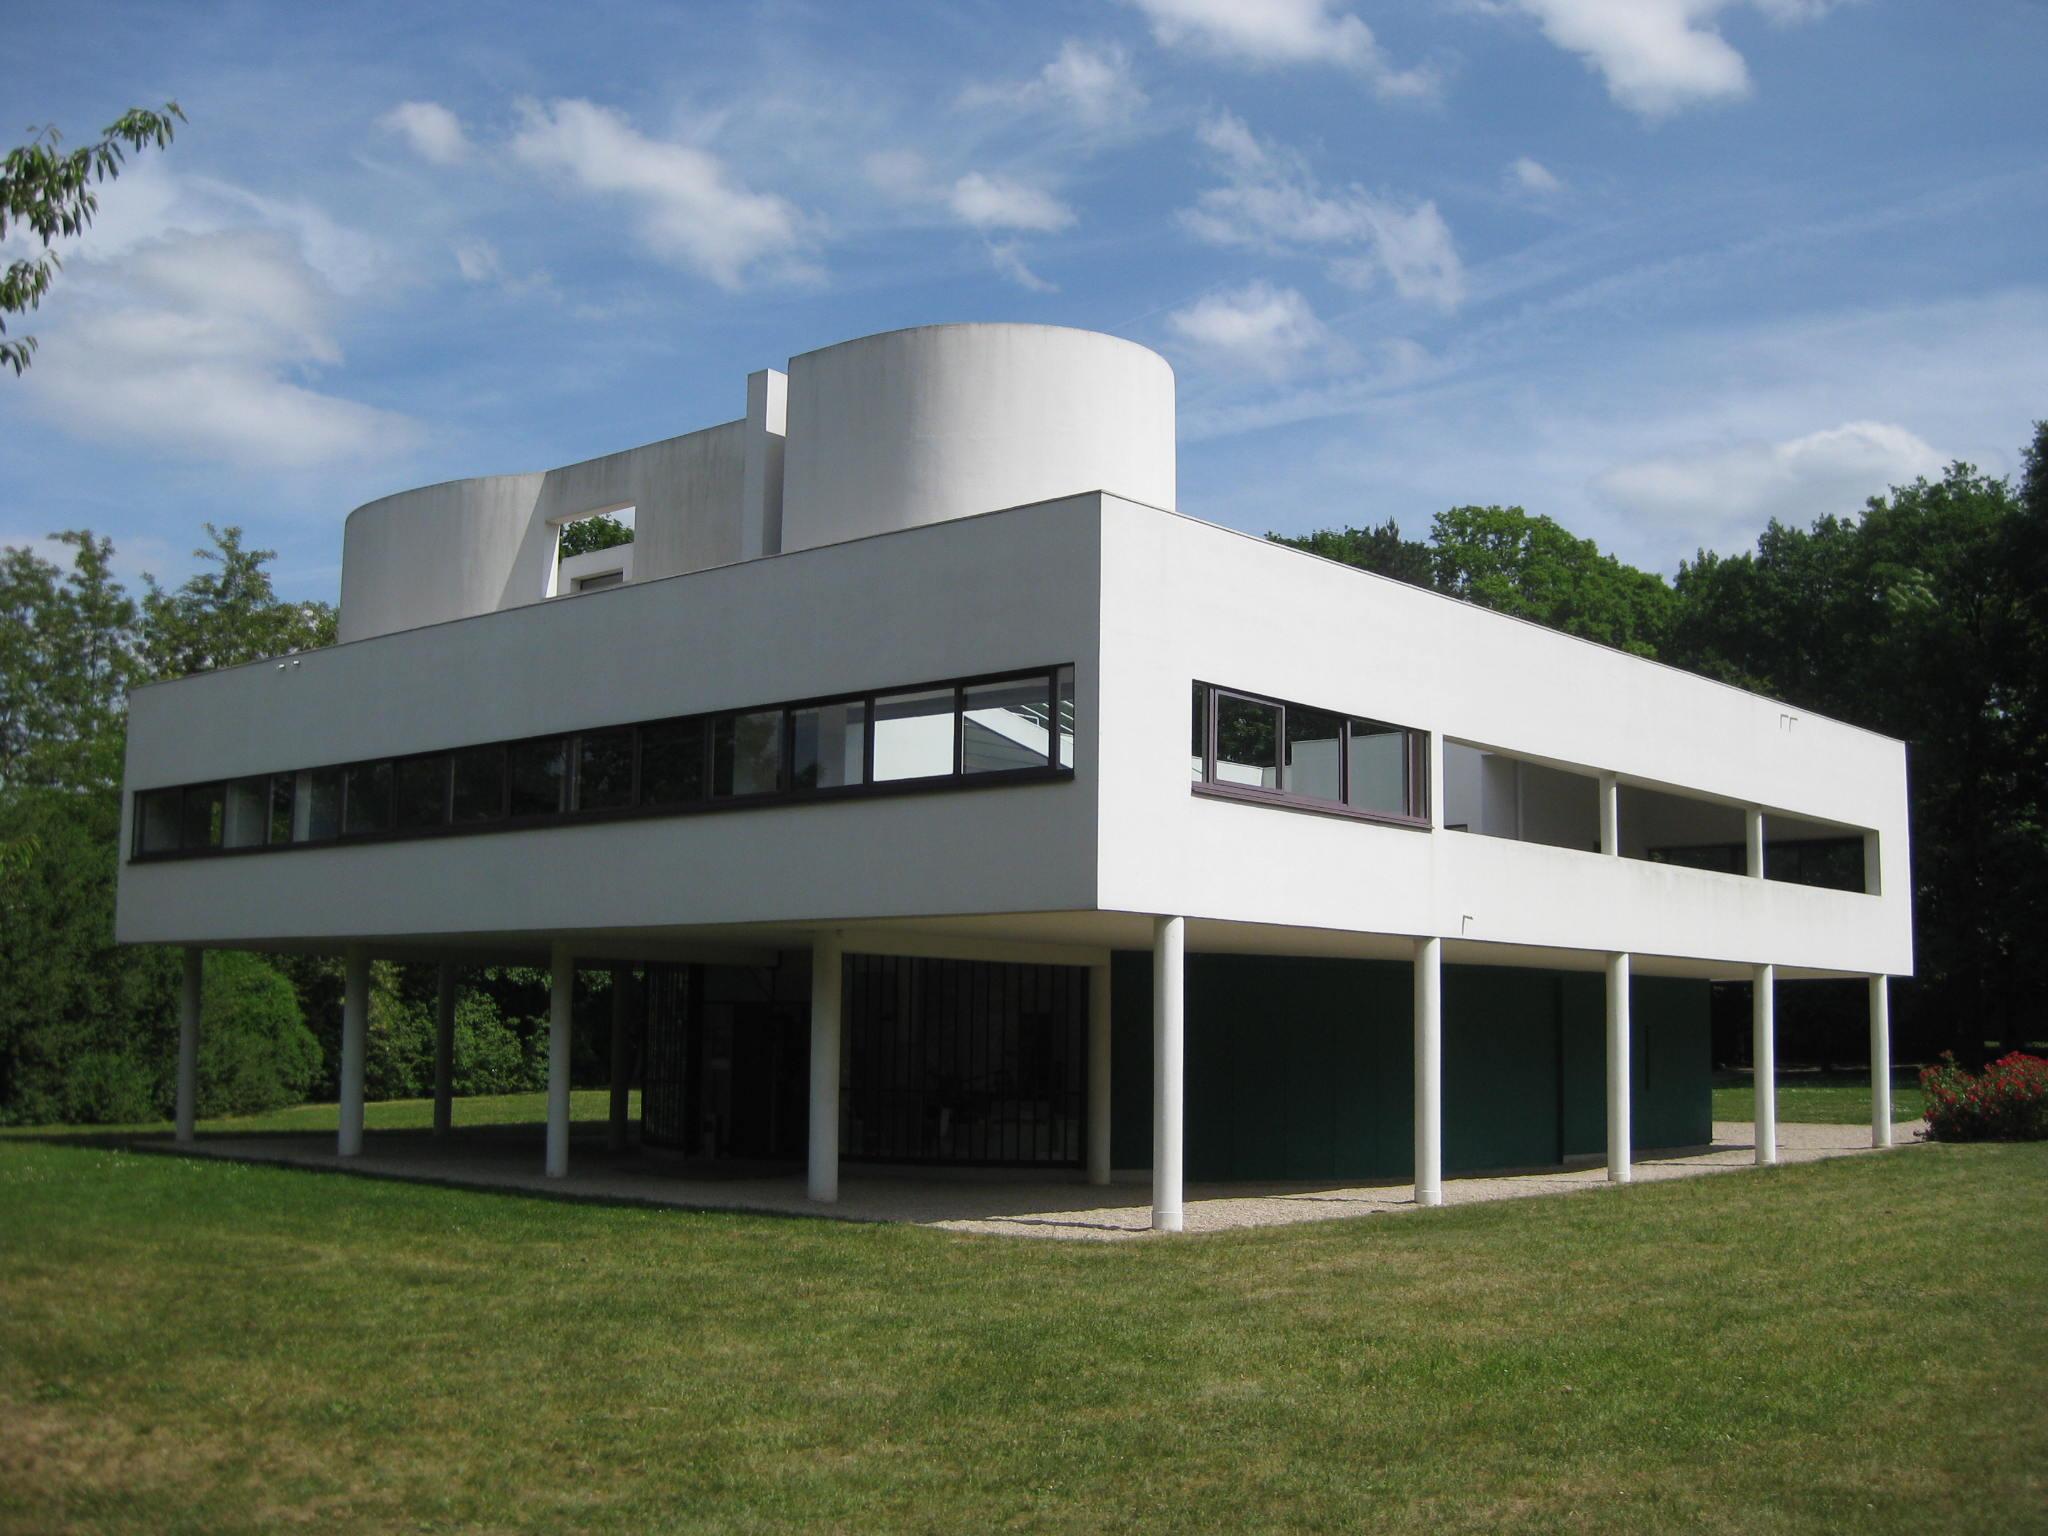 villa savoye elevation plan joy studio design gallery. Black Bedroom Furniture Sets. Home Design Ideas